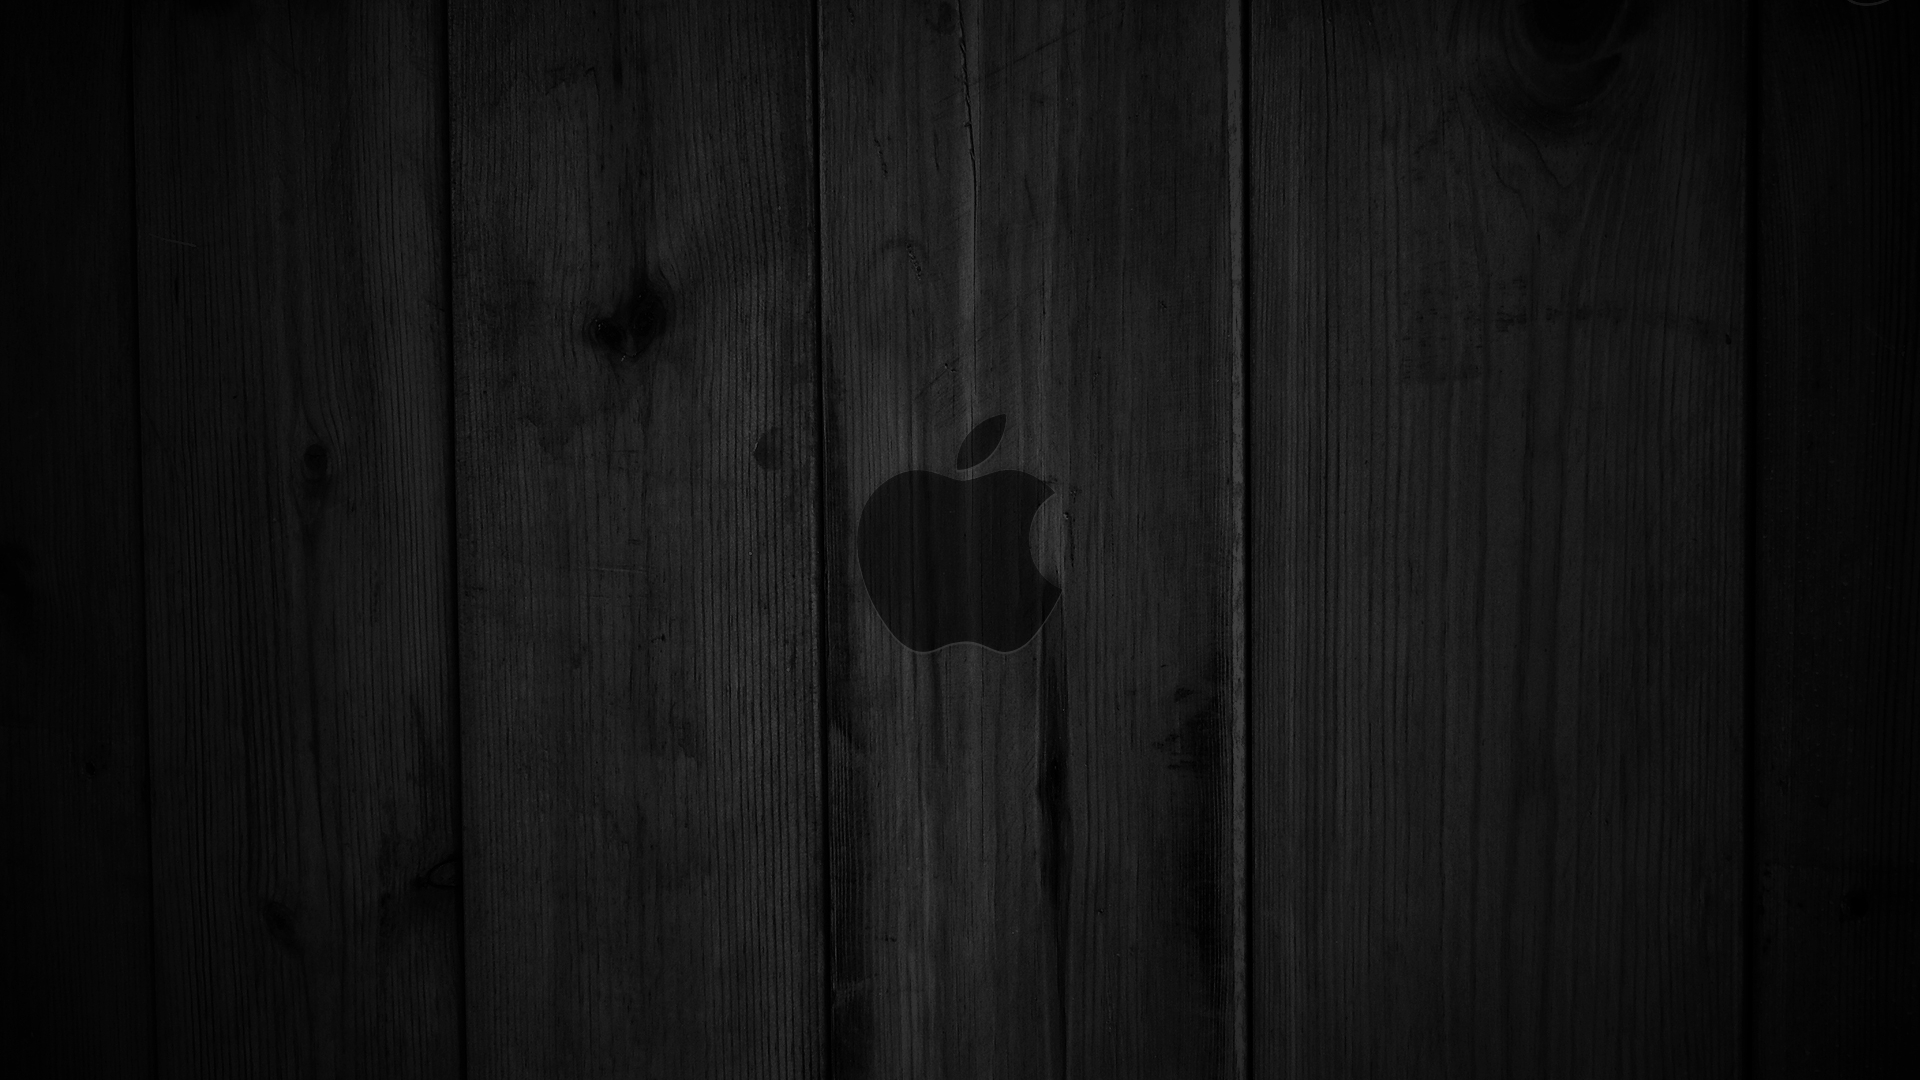 Dark wood OS X Apple wallpaper